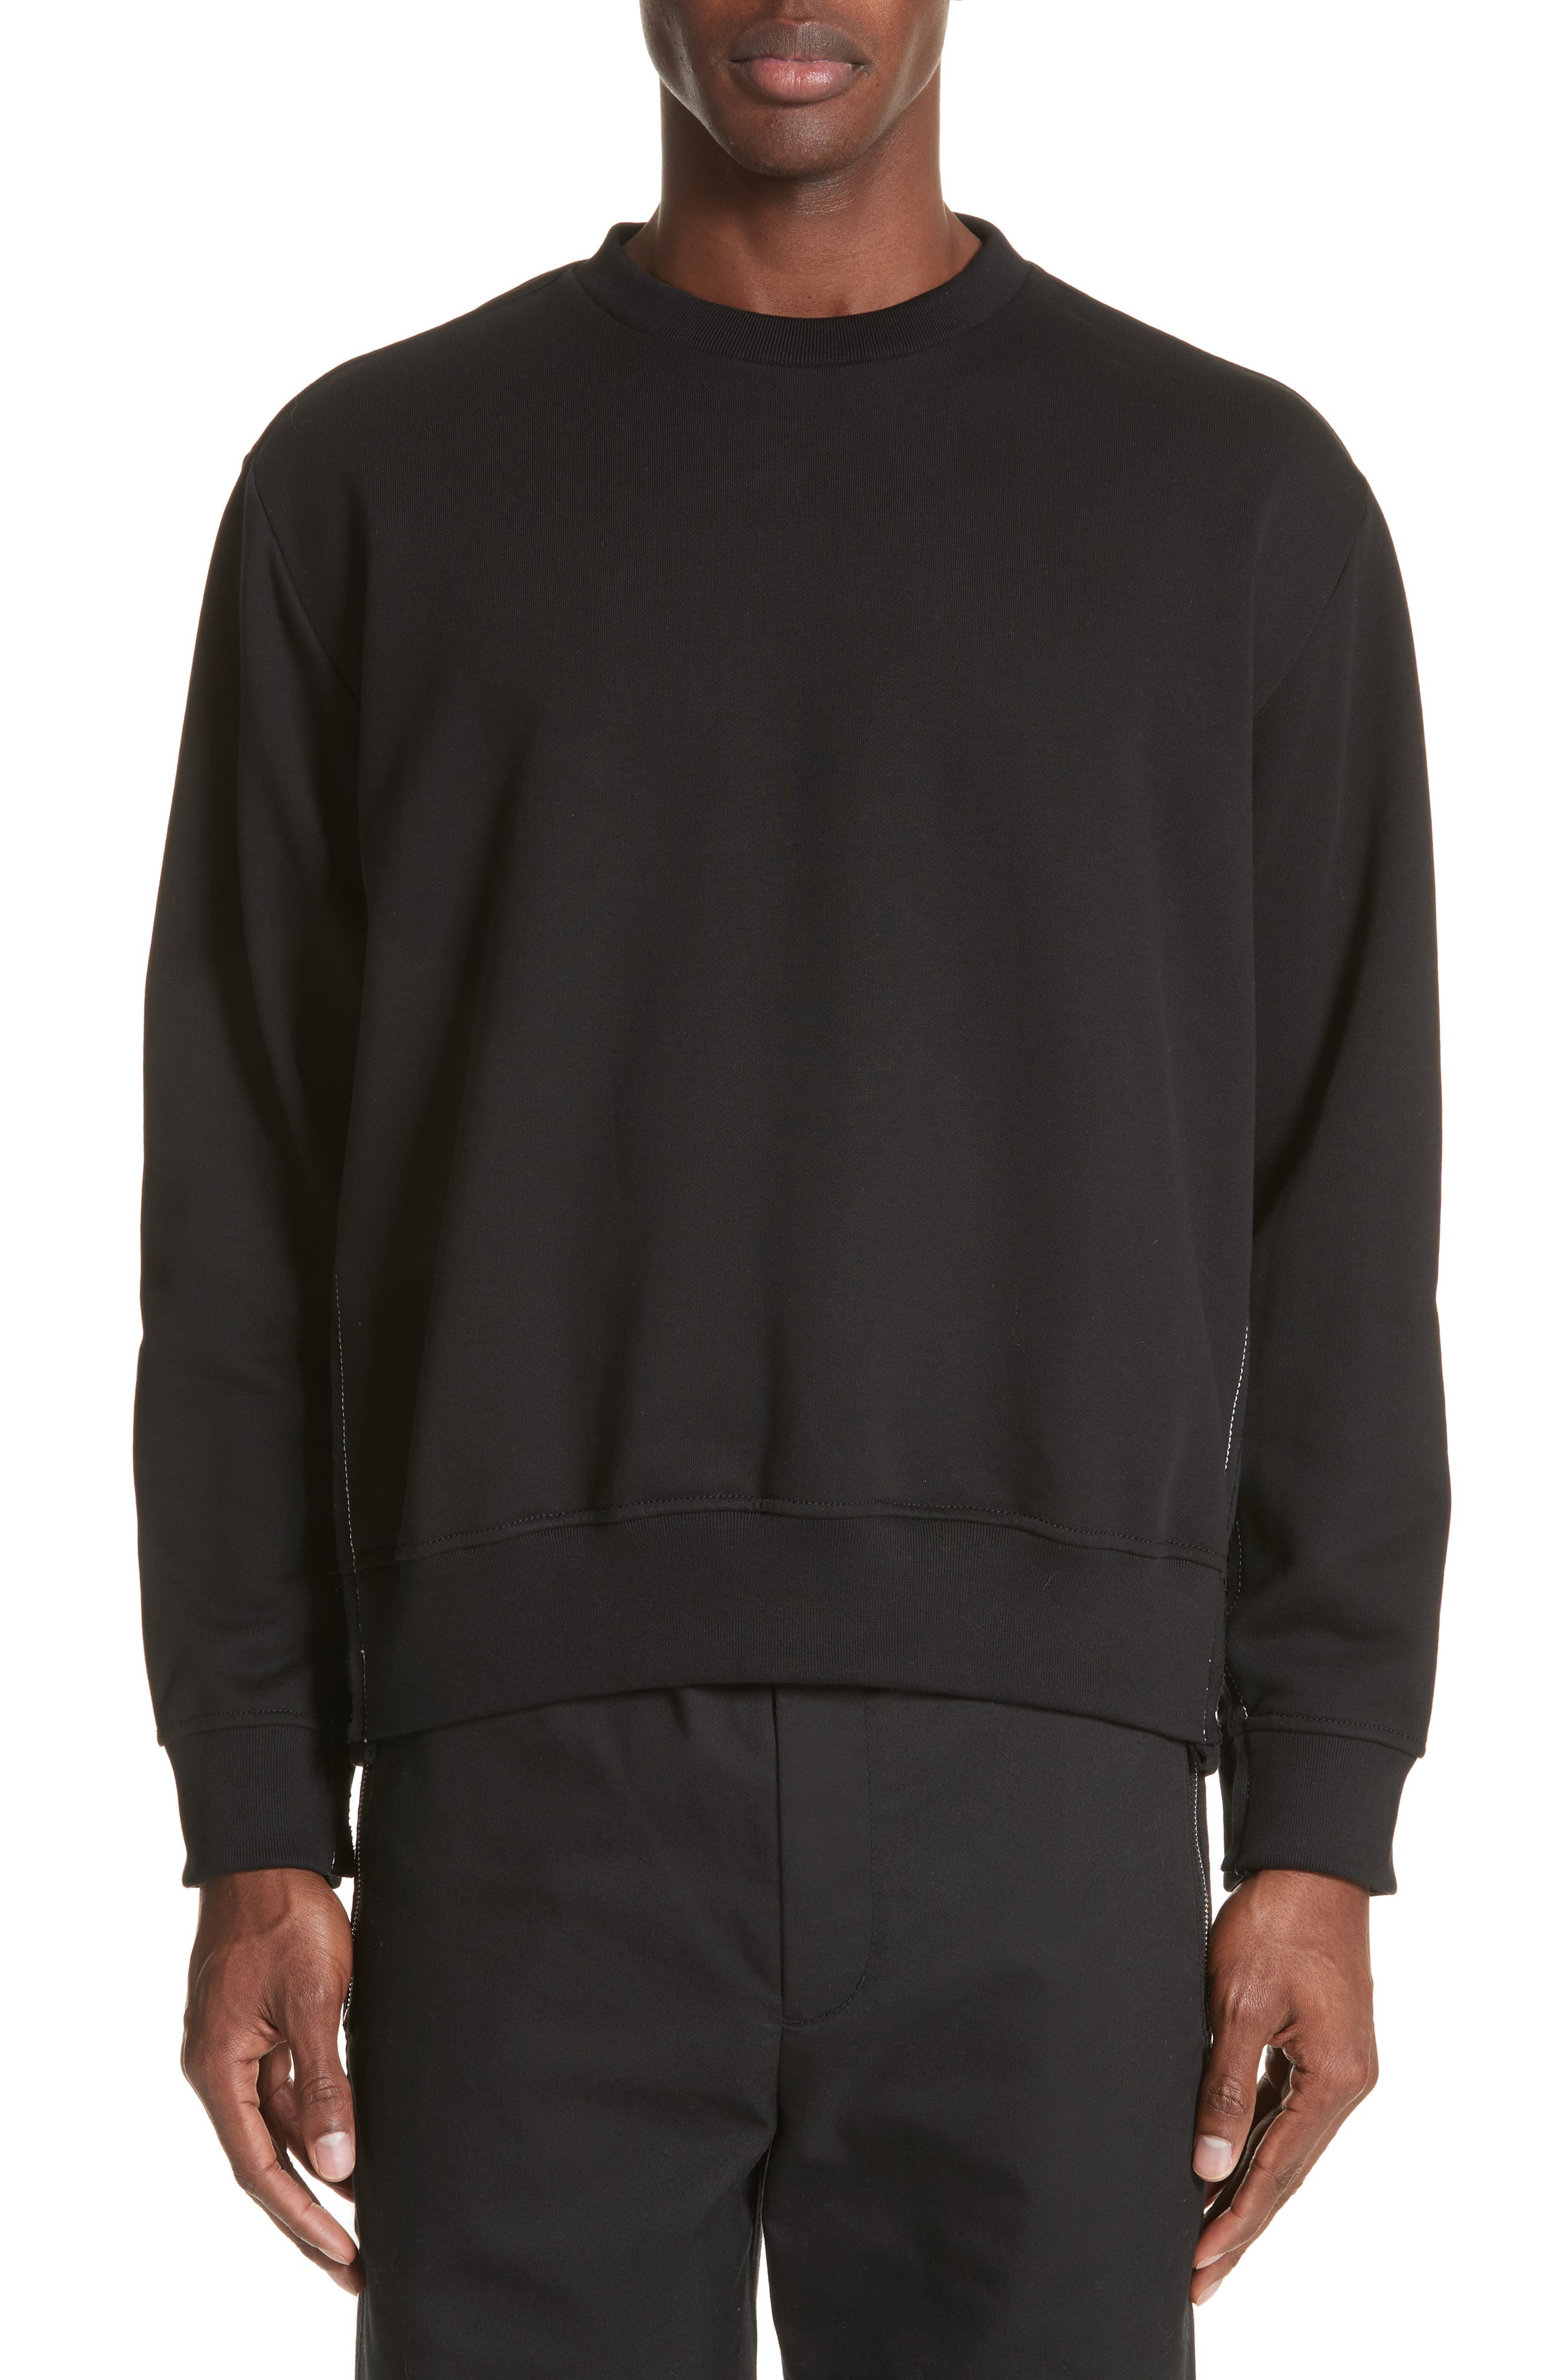 Reconstructed Crewneck Sweatshirt,                             Main thumbnail 1, color,                             Black